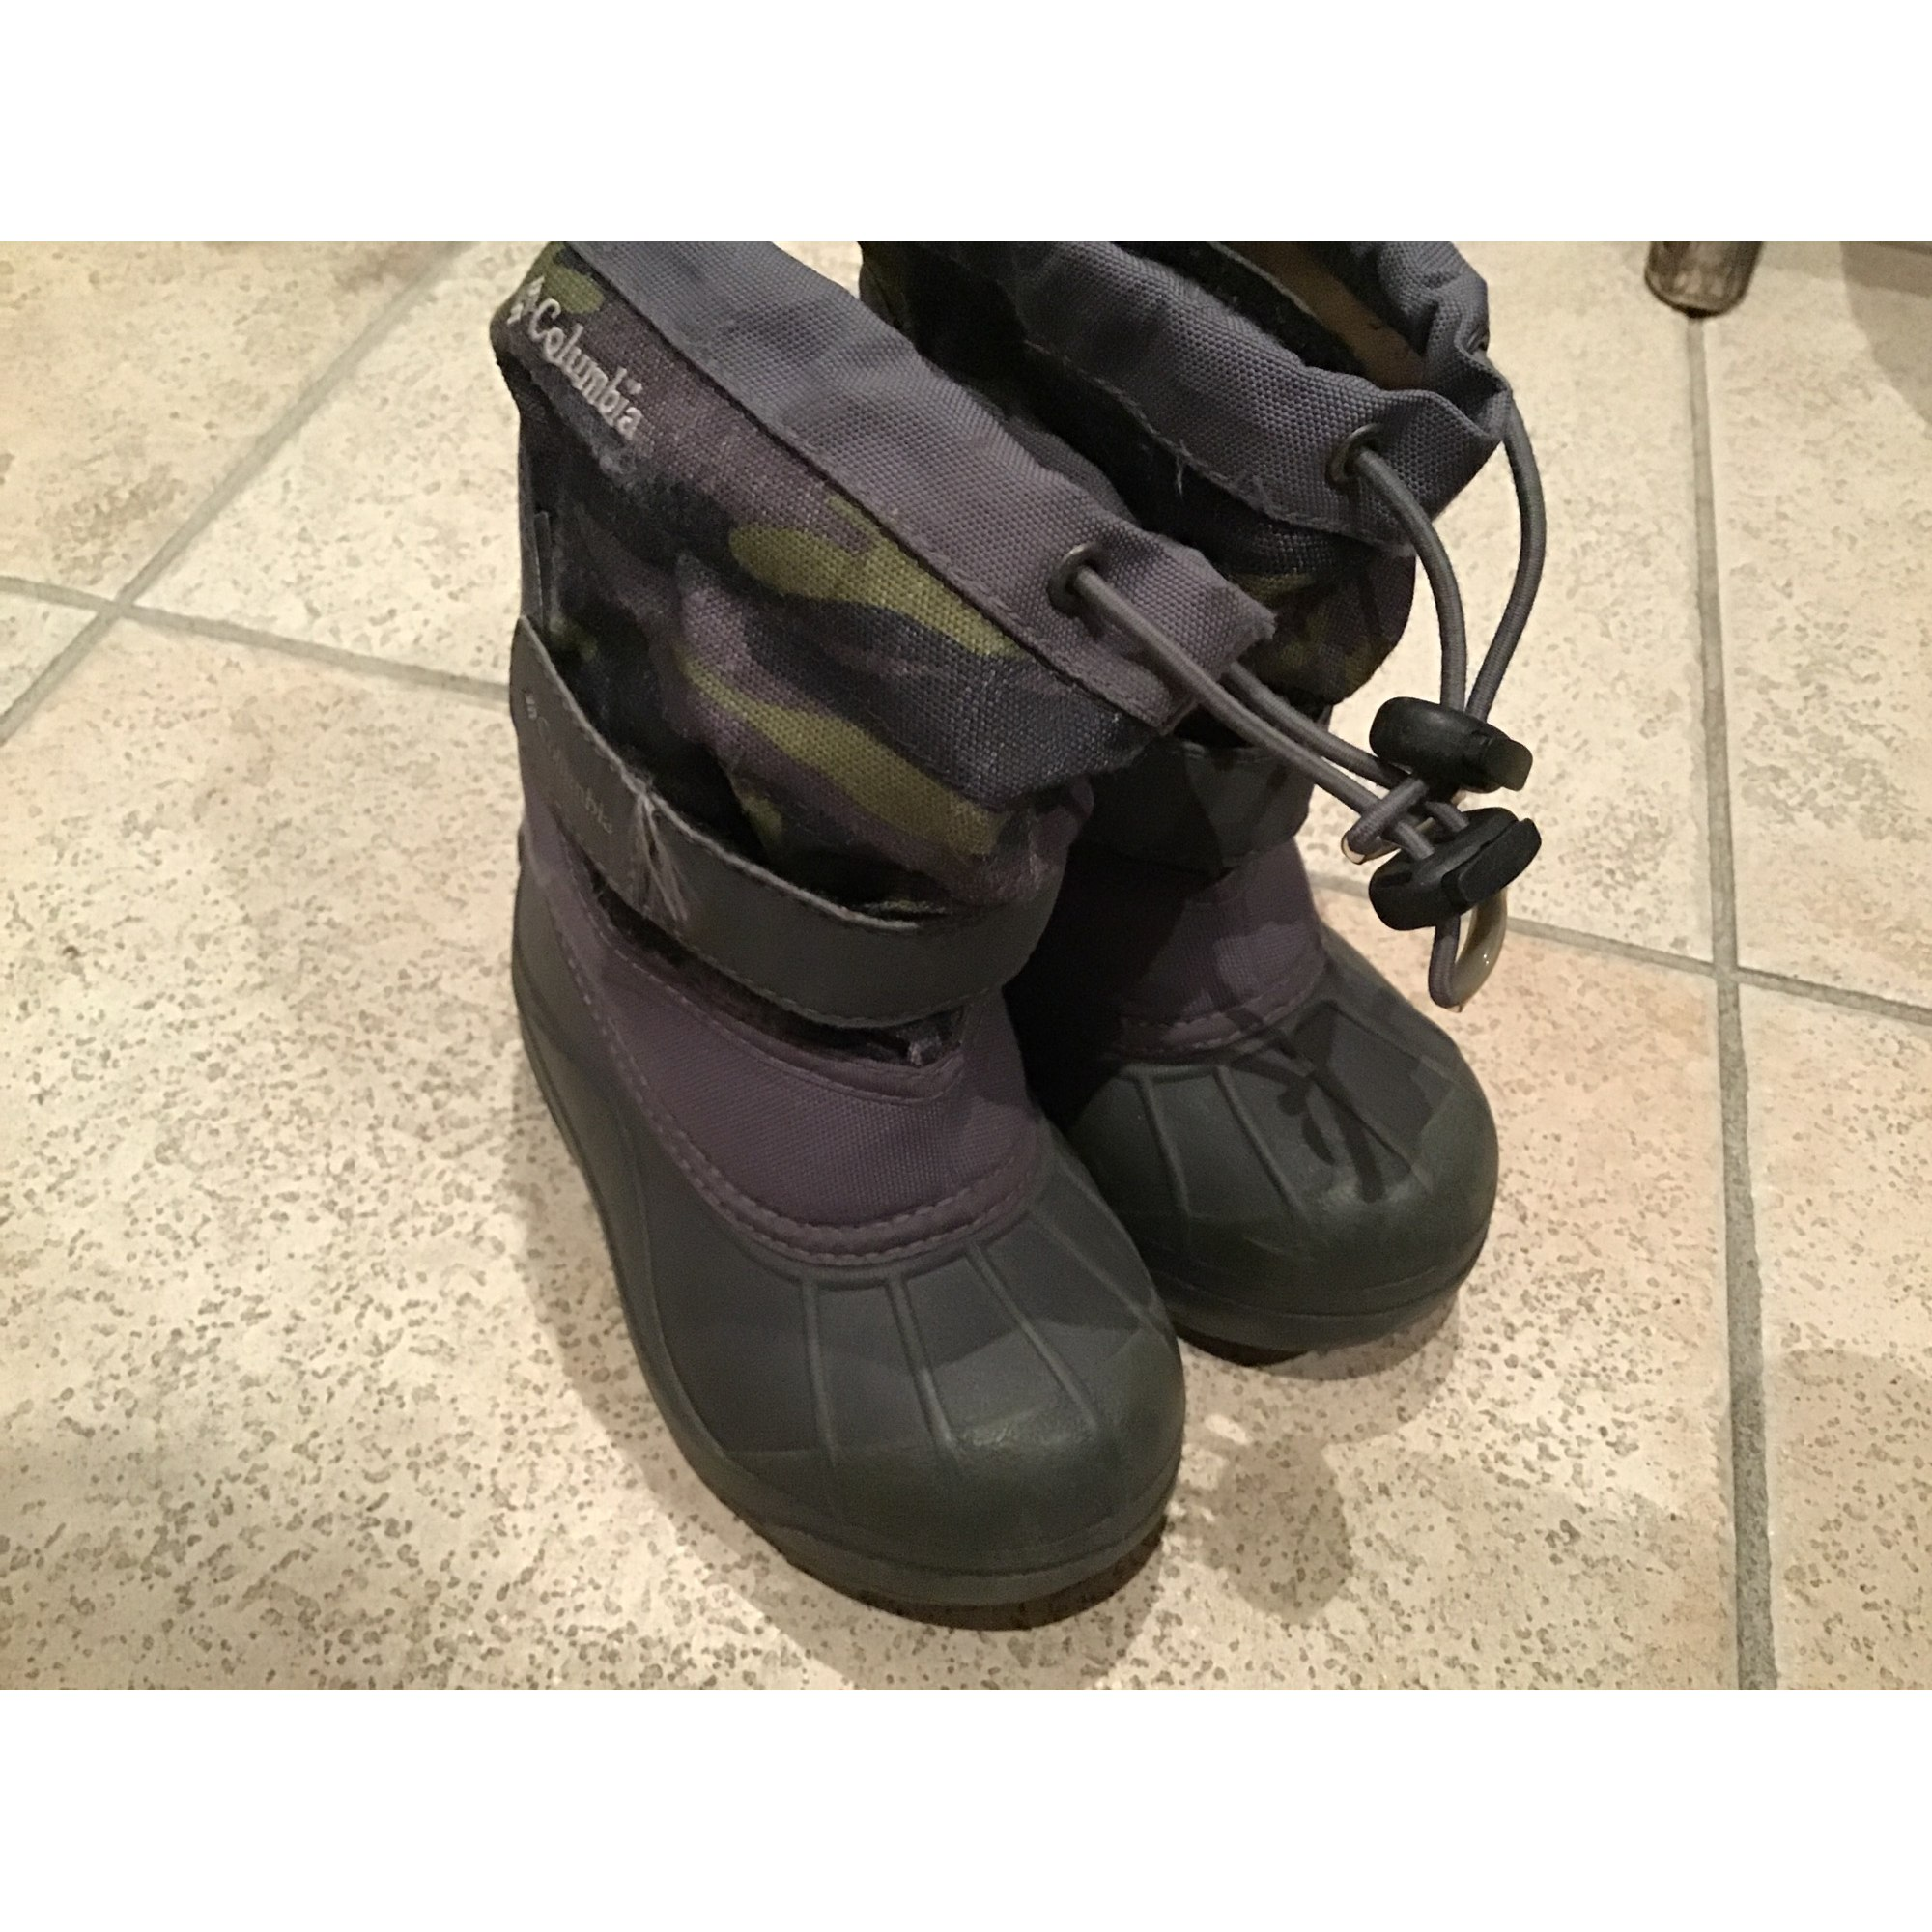 Chaussons & pantoufles  COLUMBIA Vert